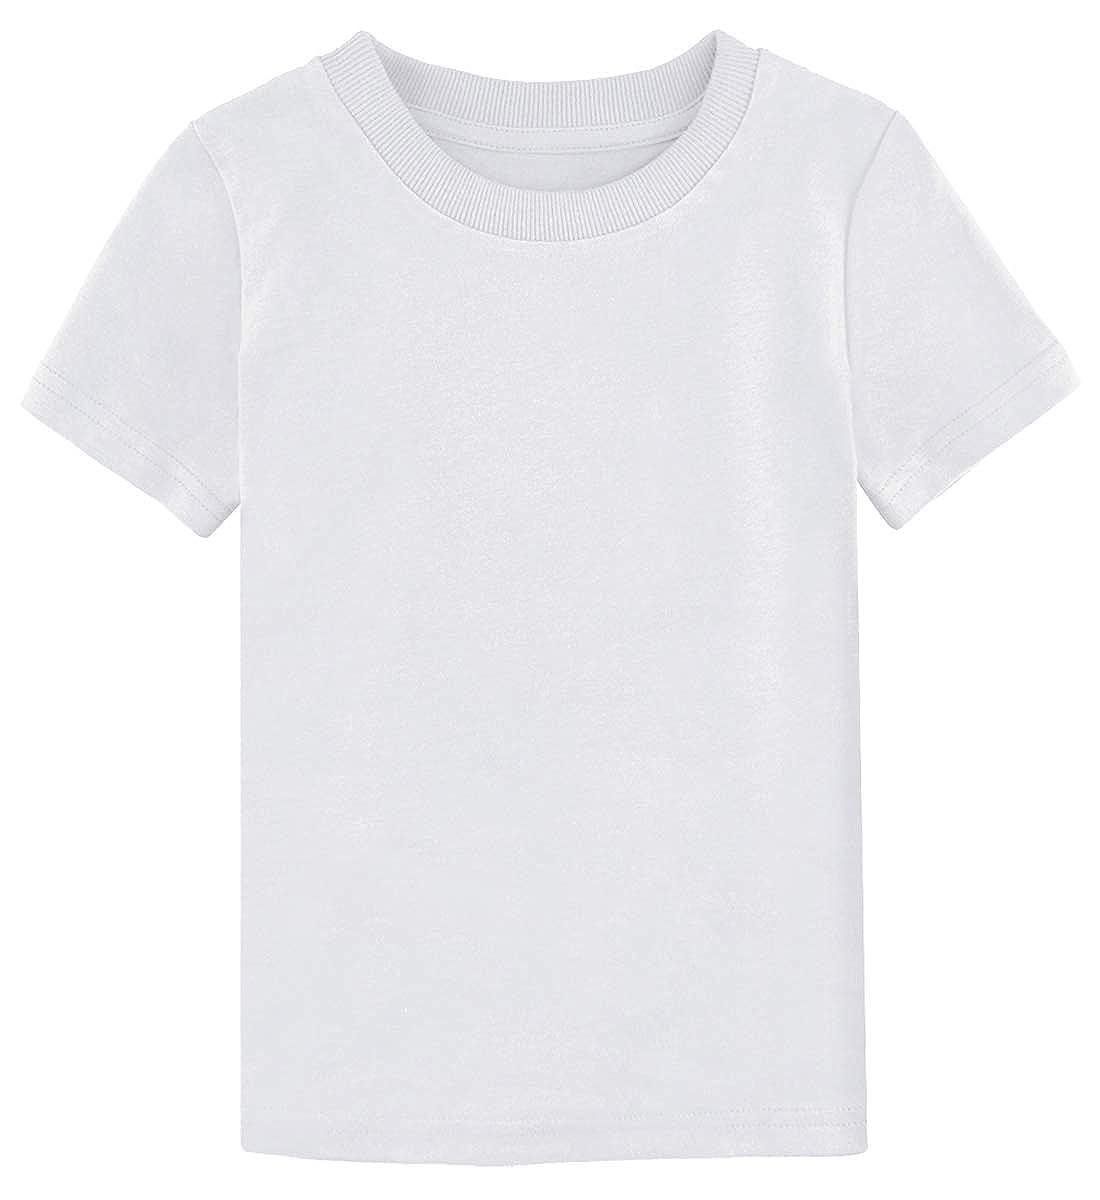 A&J DESIGN Toddler & Kids Heavyweight Cotton T-Shirt Variety of Colors